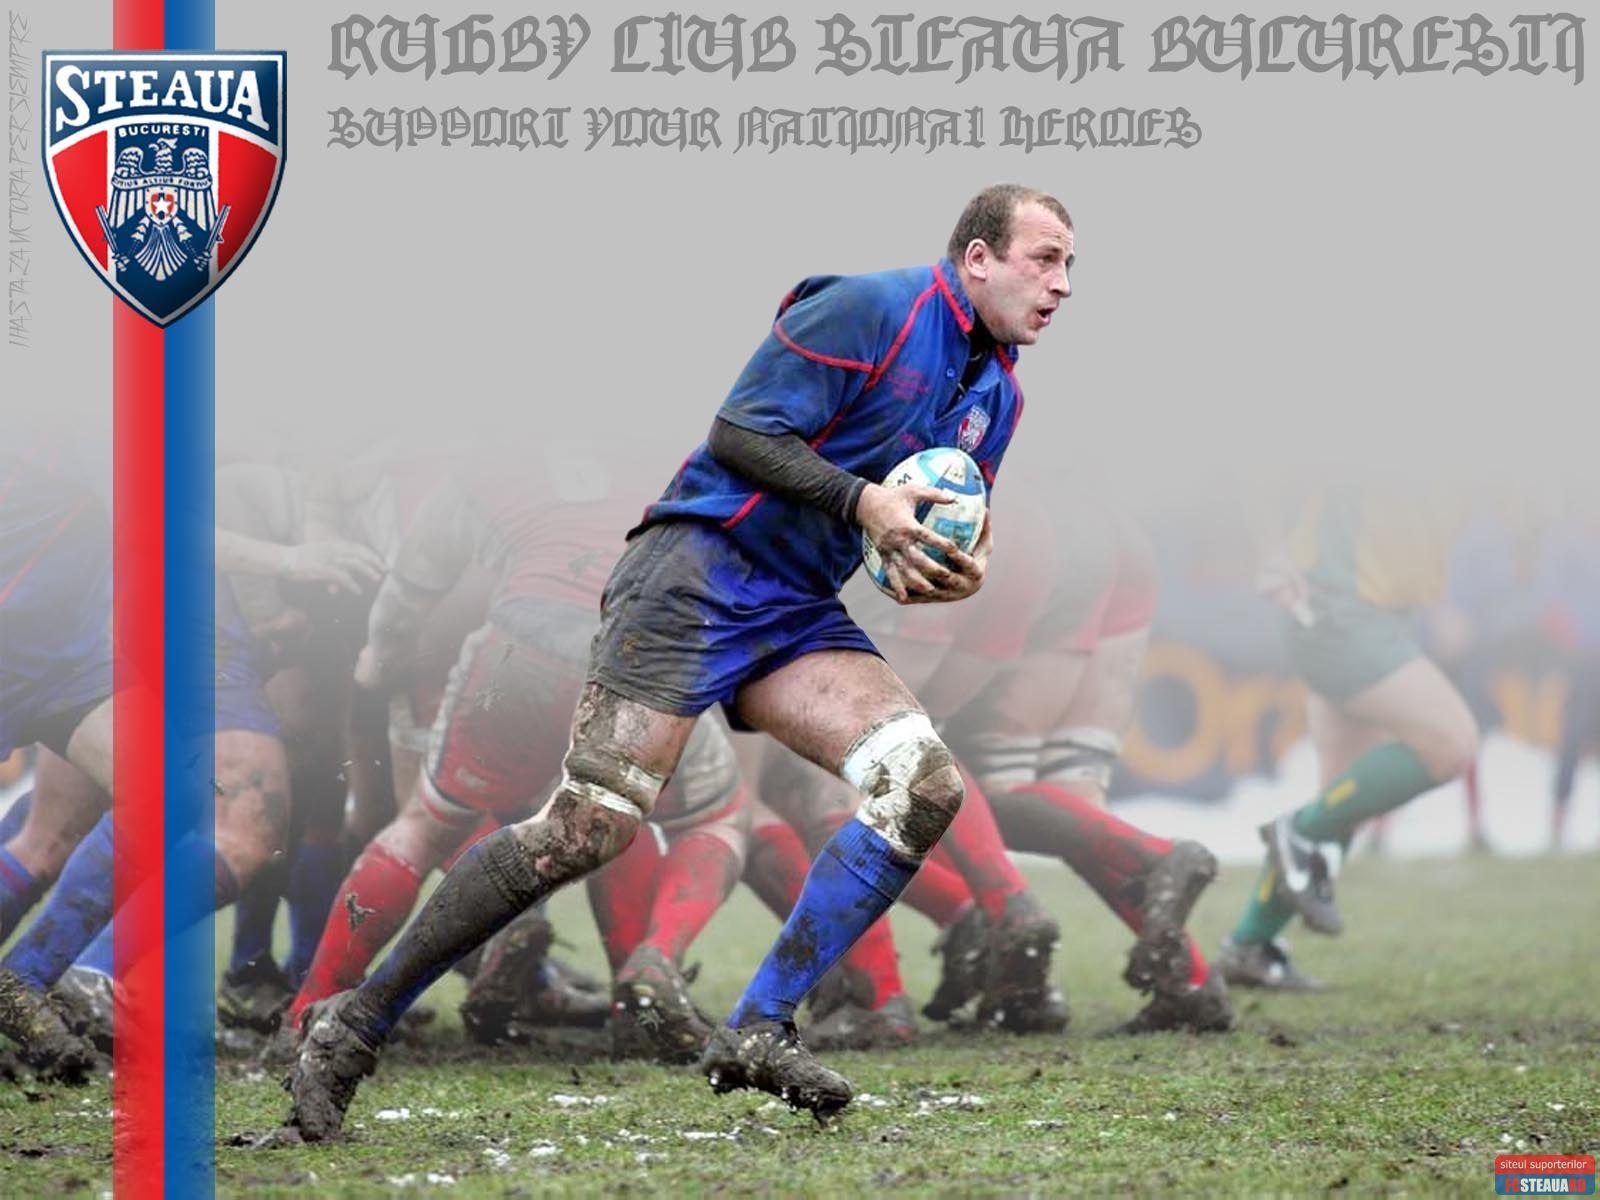 steaua bucuresti rugby club steaua bucuresti support your national ...